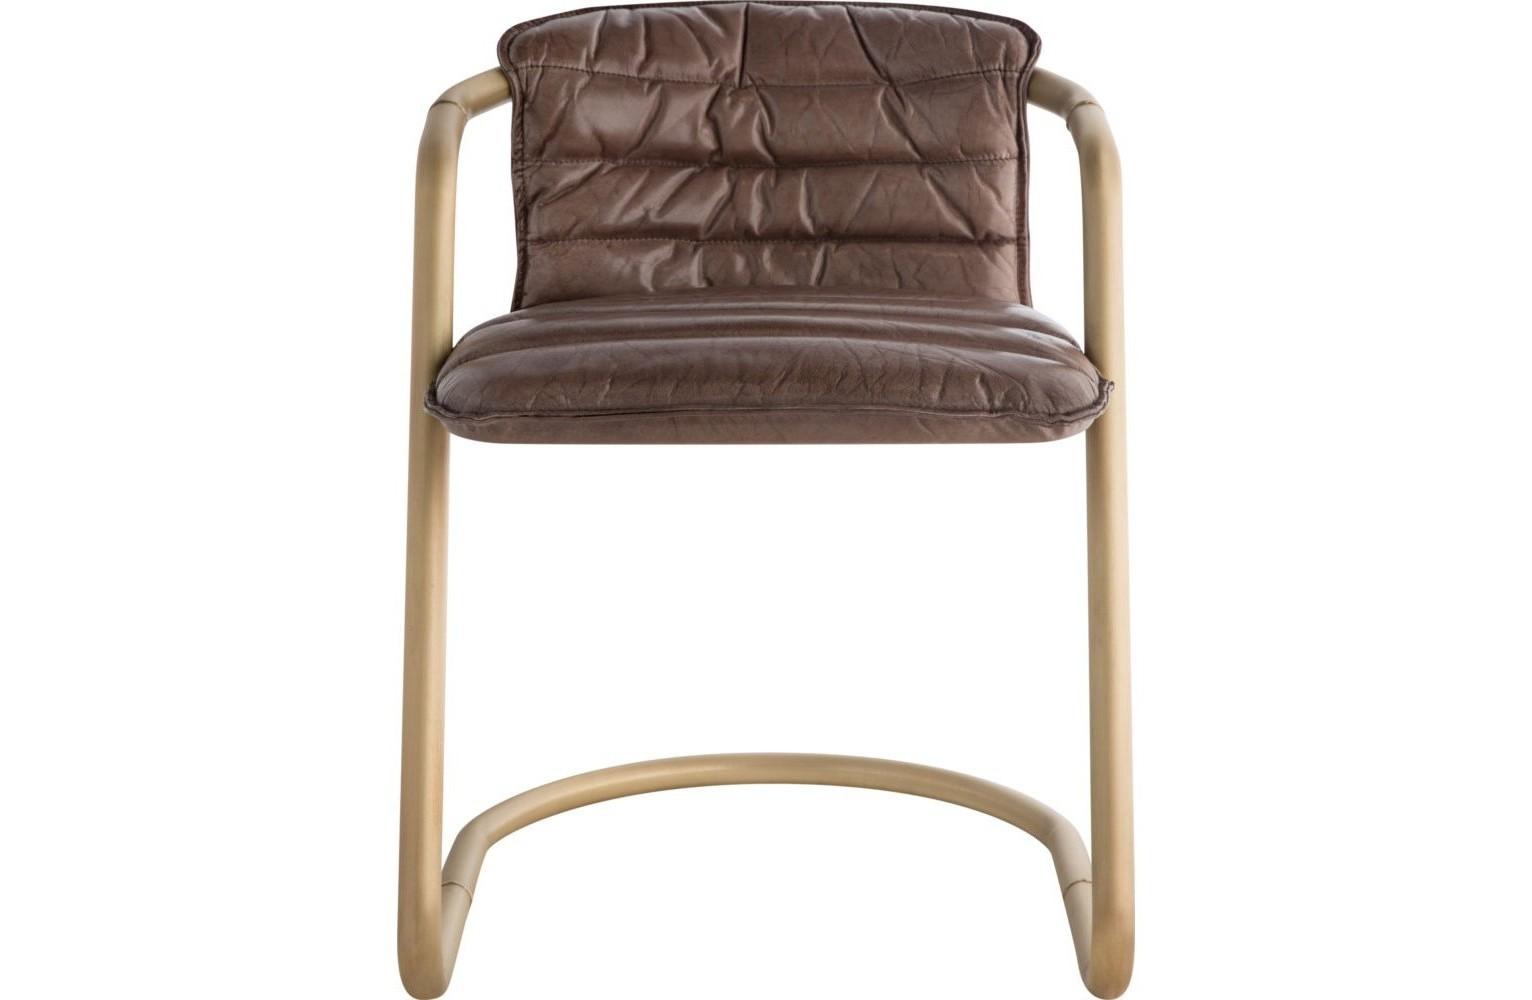 Кухонный стул M-Style 15436821 от thefurnish